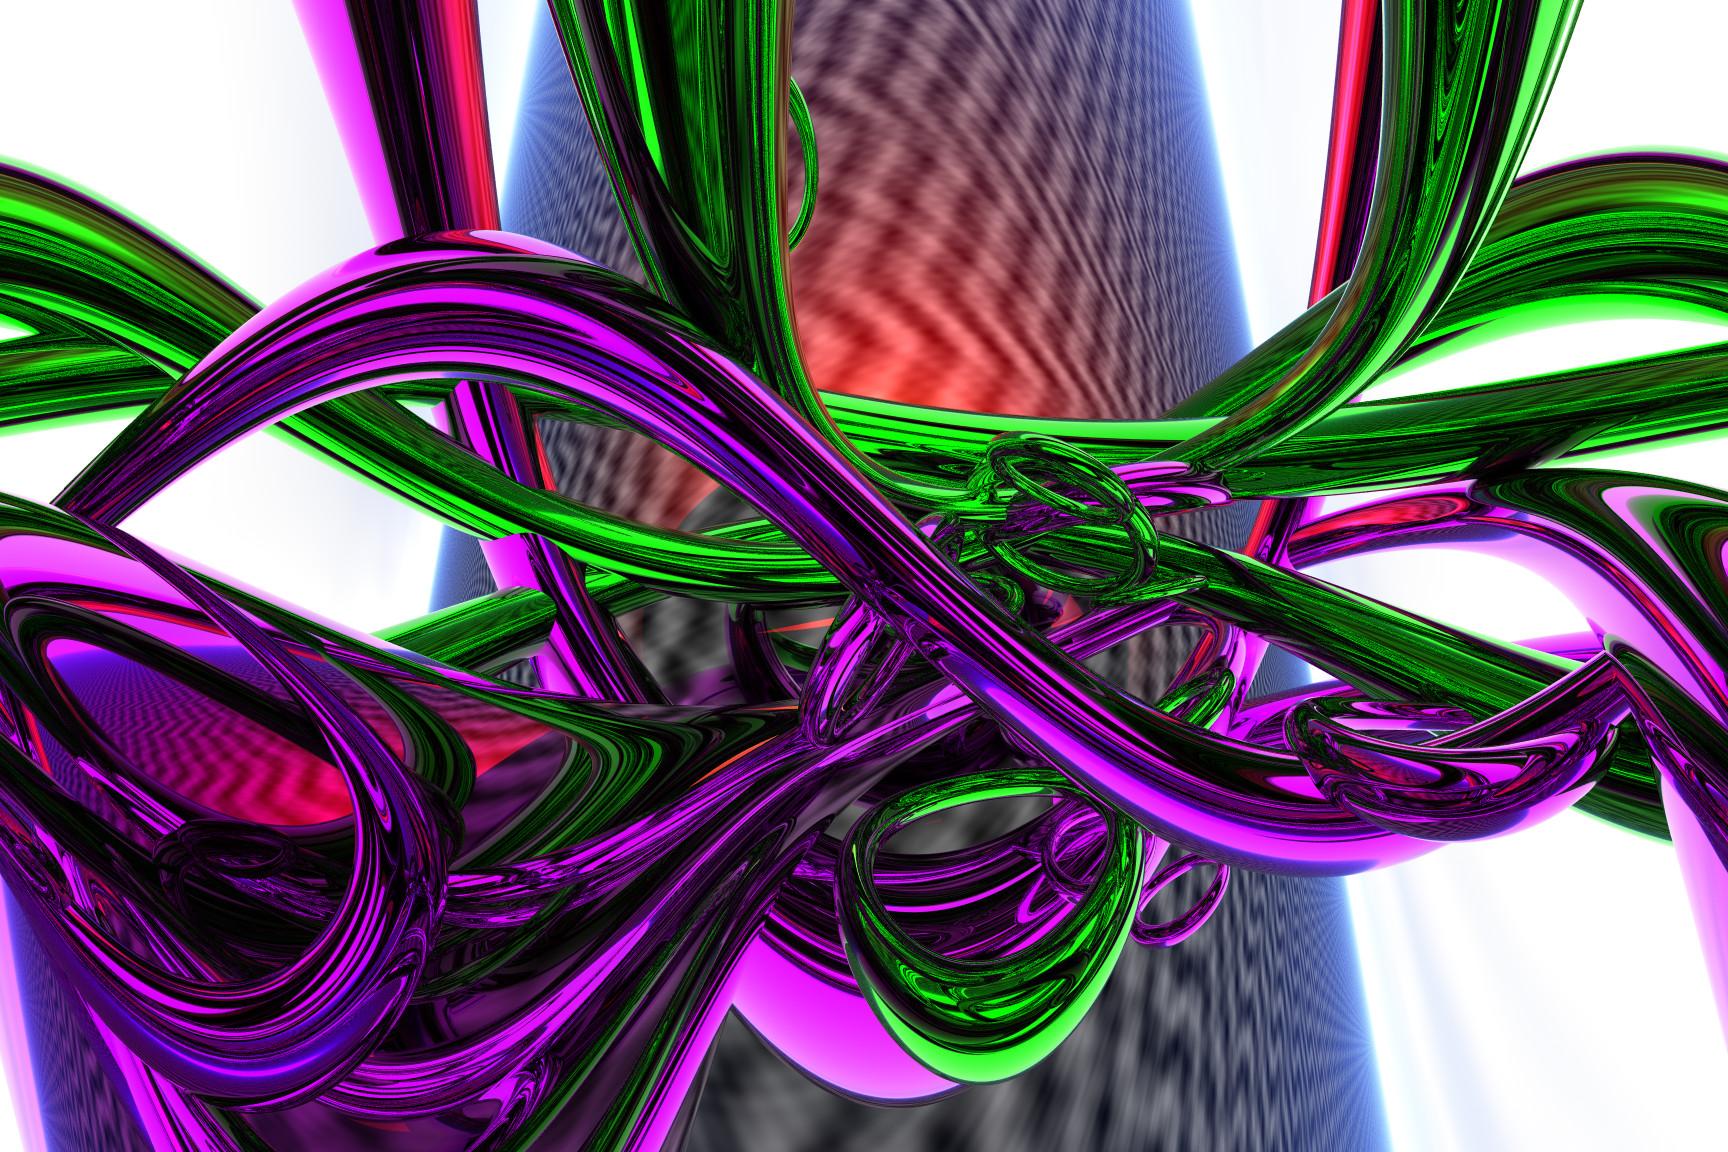 kaotika v1 by karma4ya